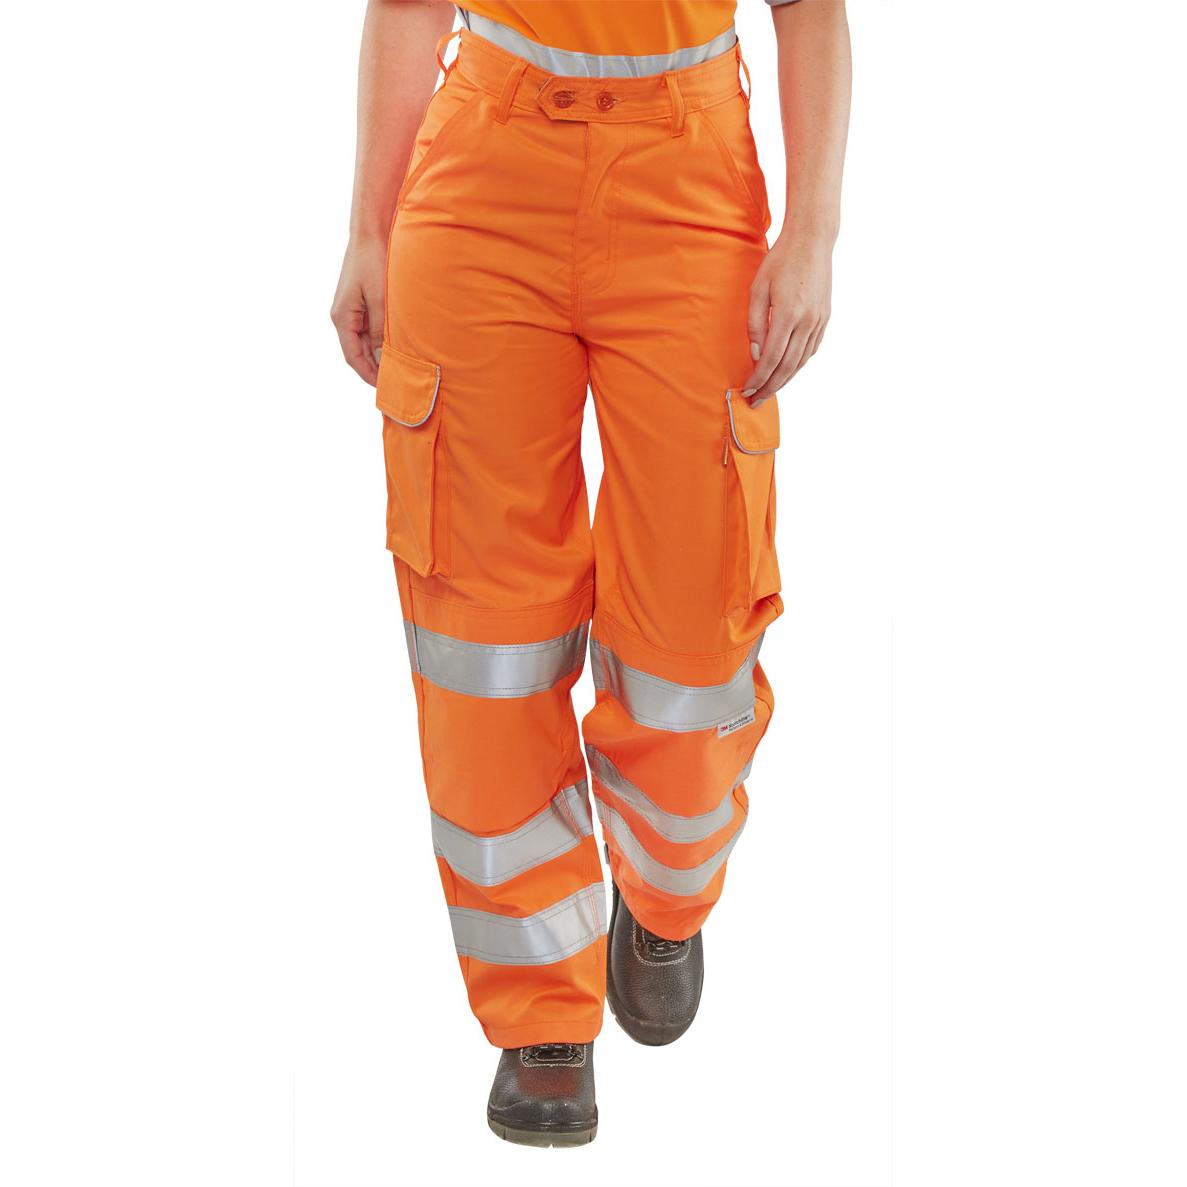 Ladies BSeen Rail Spec Trousers Ladies Teflon Hi-Vis Reflective Orange 34 Ref LRST34 *Up to 3 Day Leadtime*